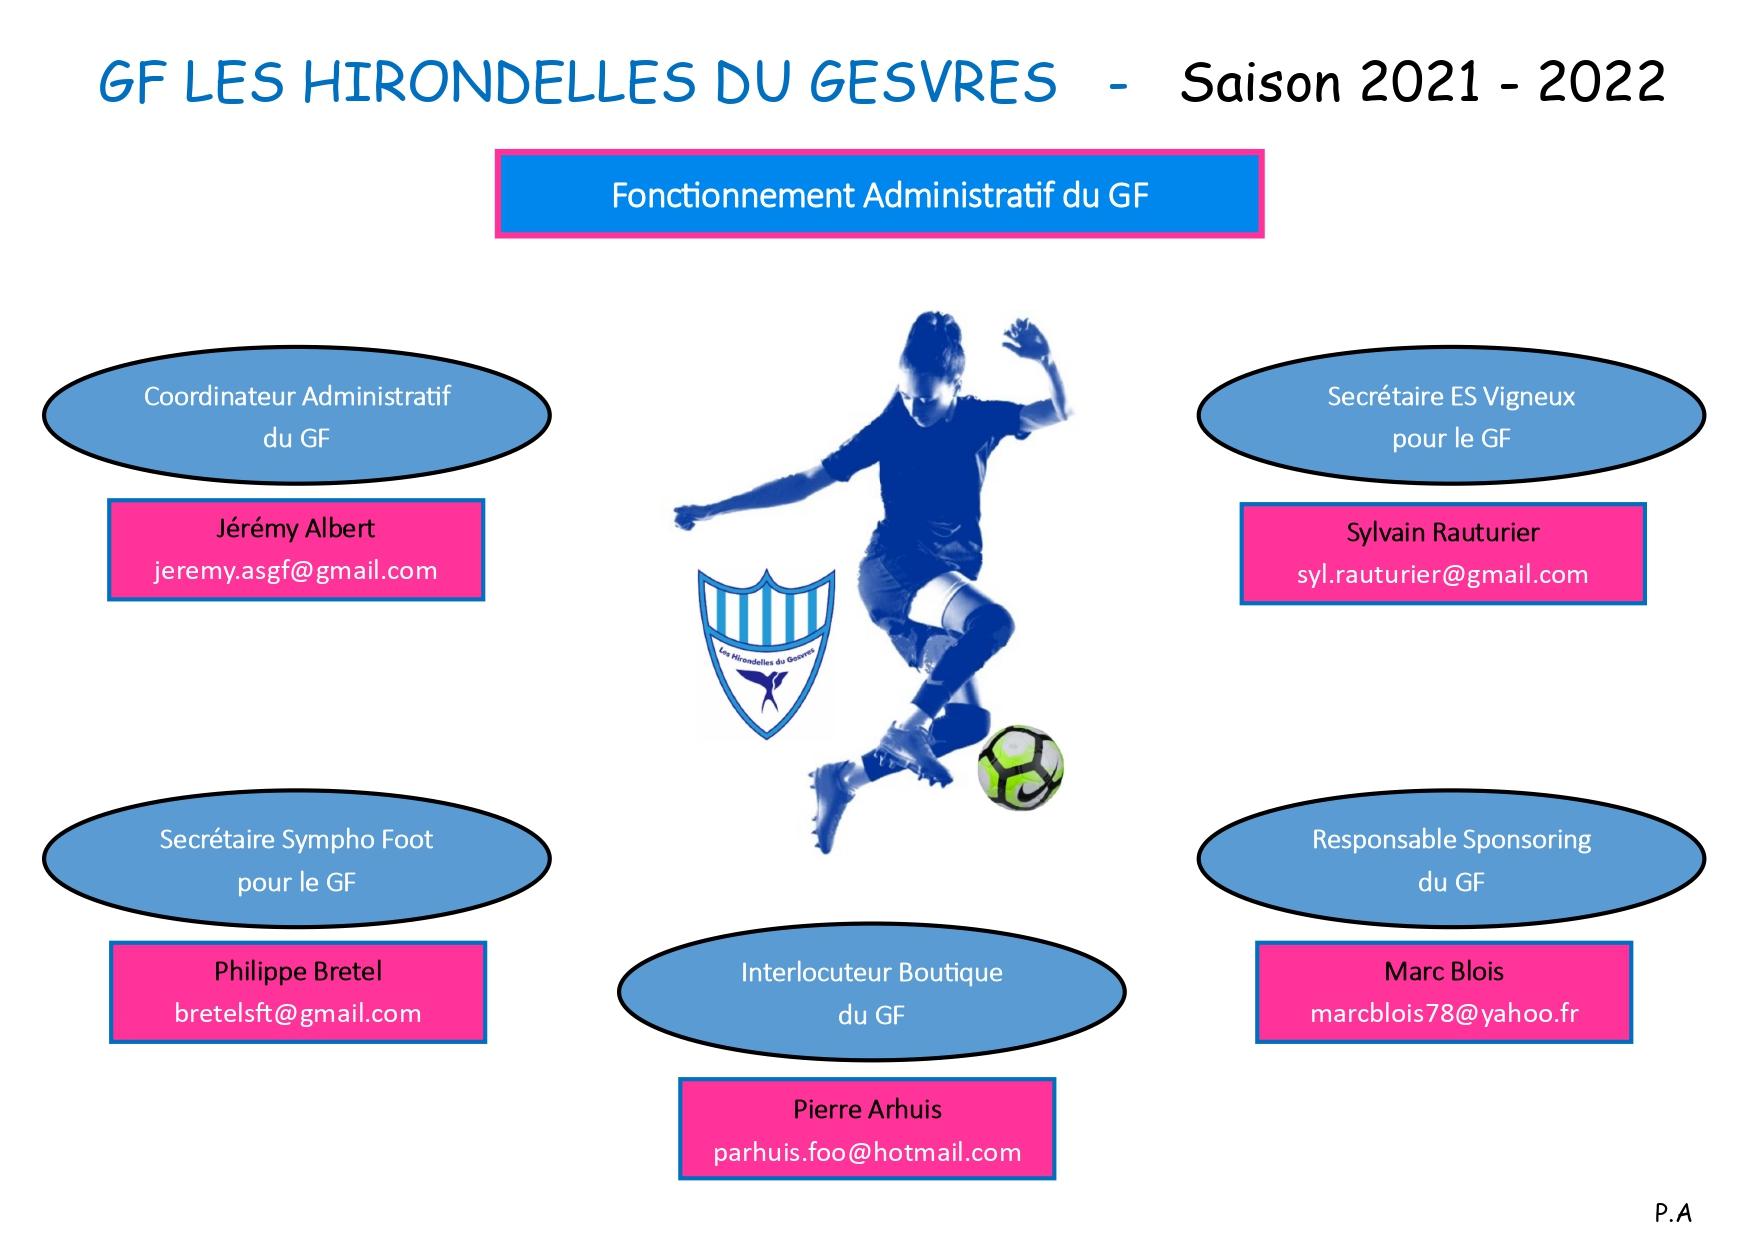 Organigramme administratif du GF saison 2021/2022